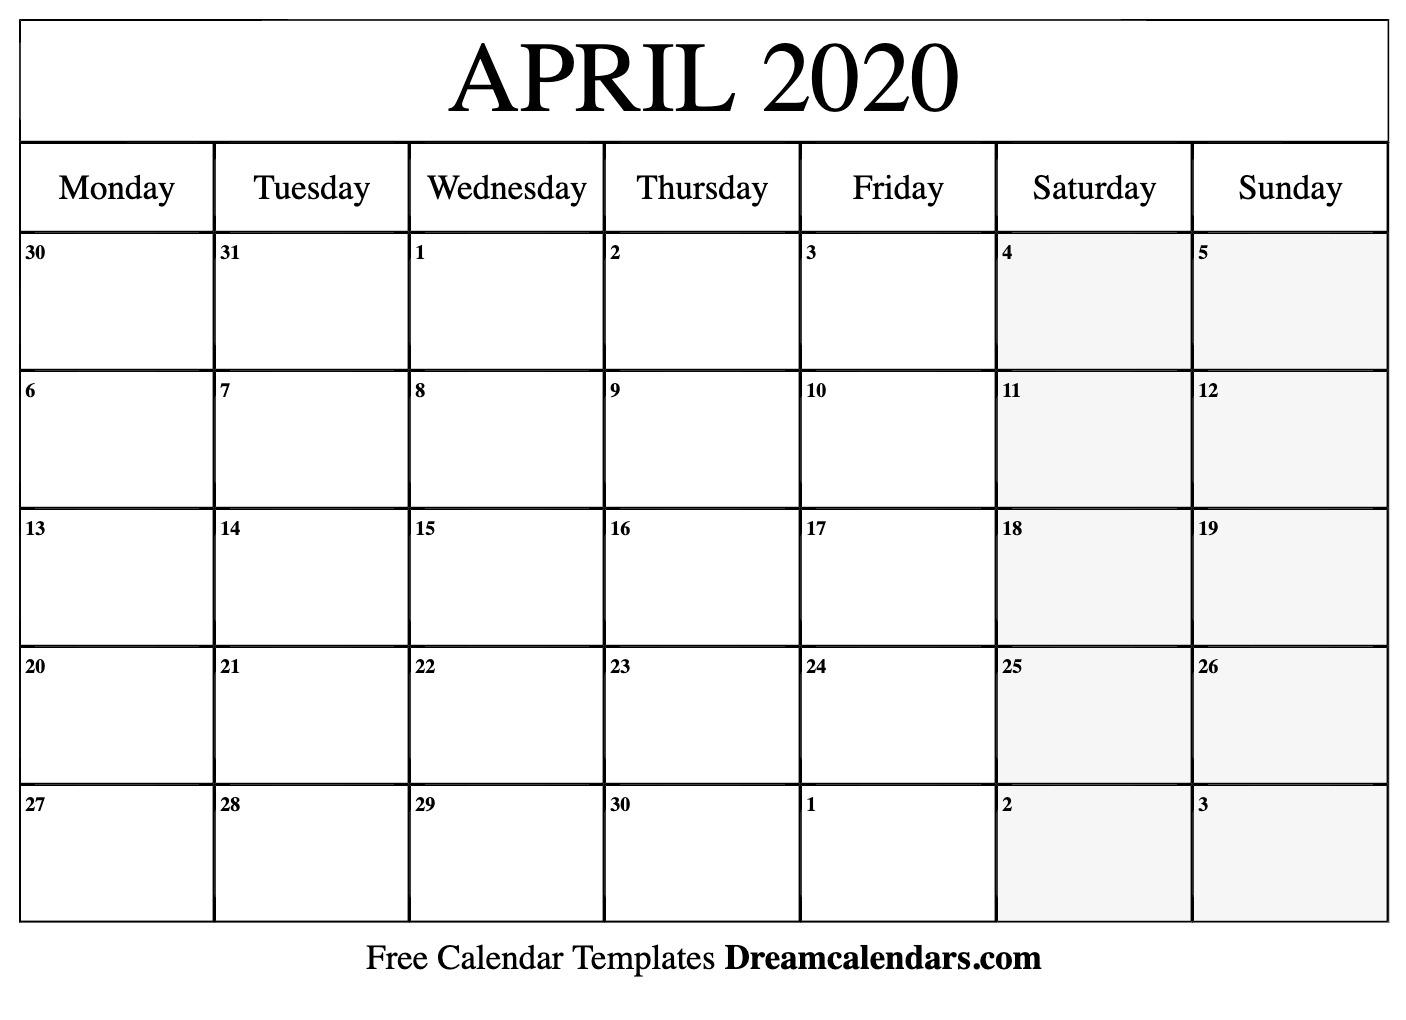 Printable April 2020 Calendar pertaining to Monday - Sunday 2020